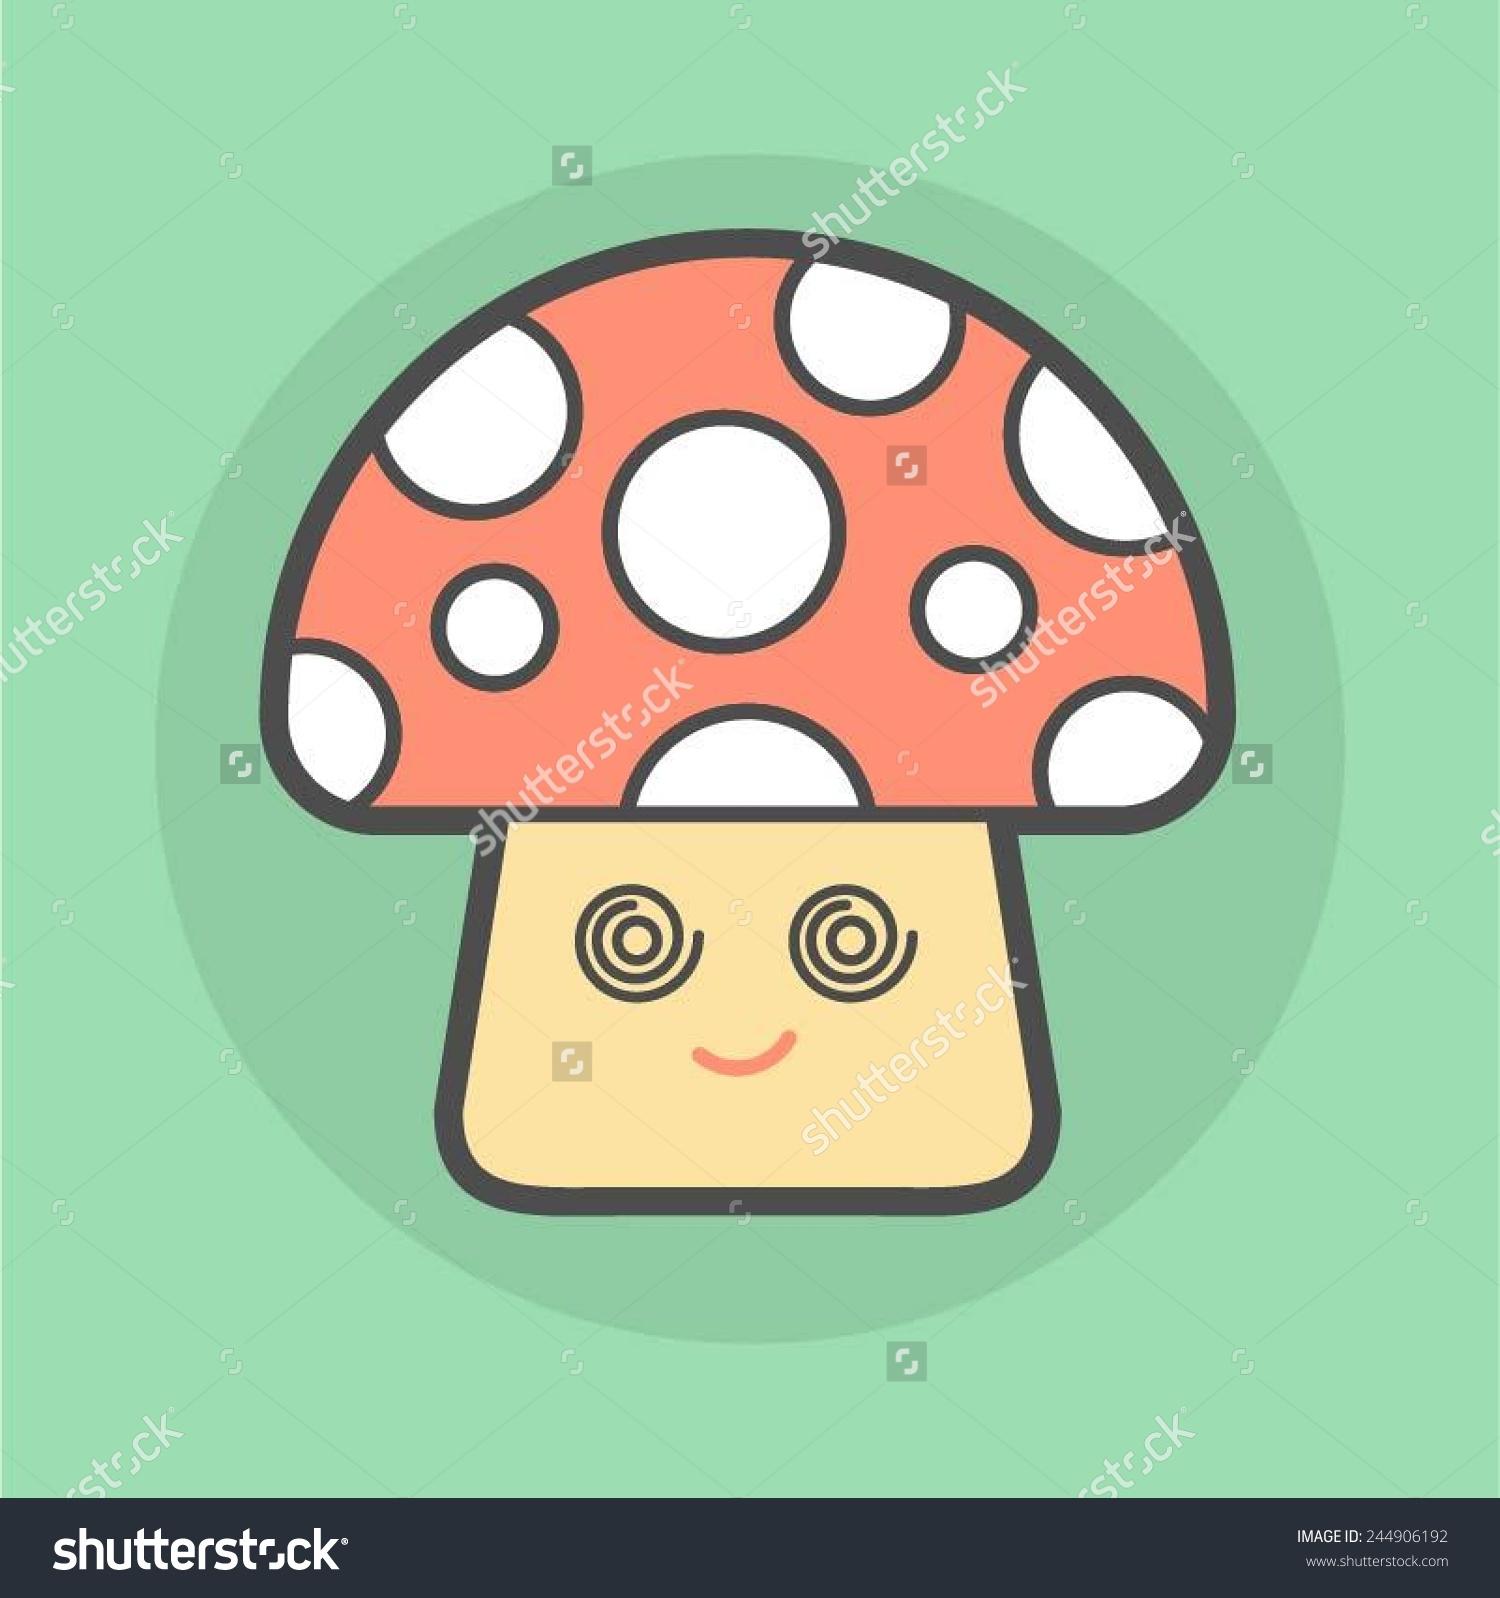 Cute Magic Mushroom With Spiral Eyes, Vector Illustration.